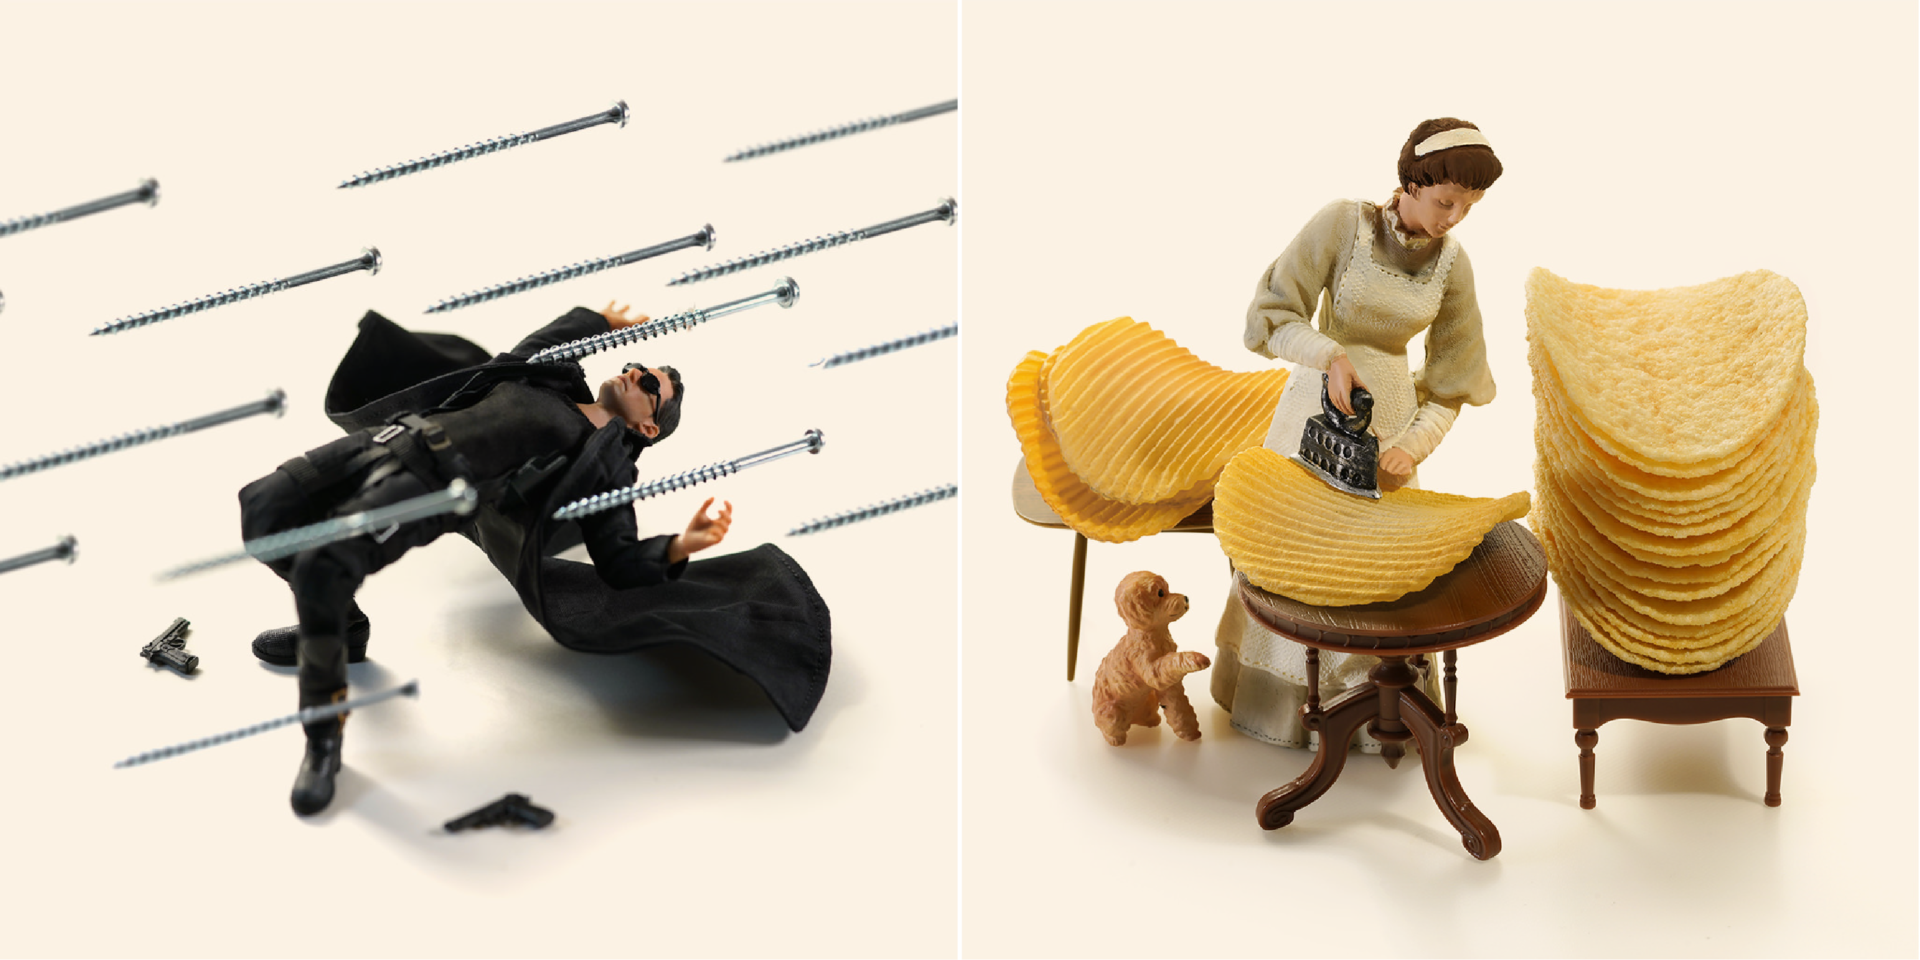 miniatura de dioramas creada por el artista Tatsuya Tanaka de miniature calendar